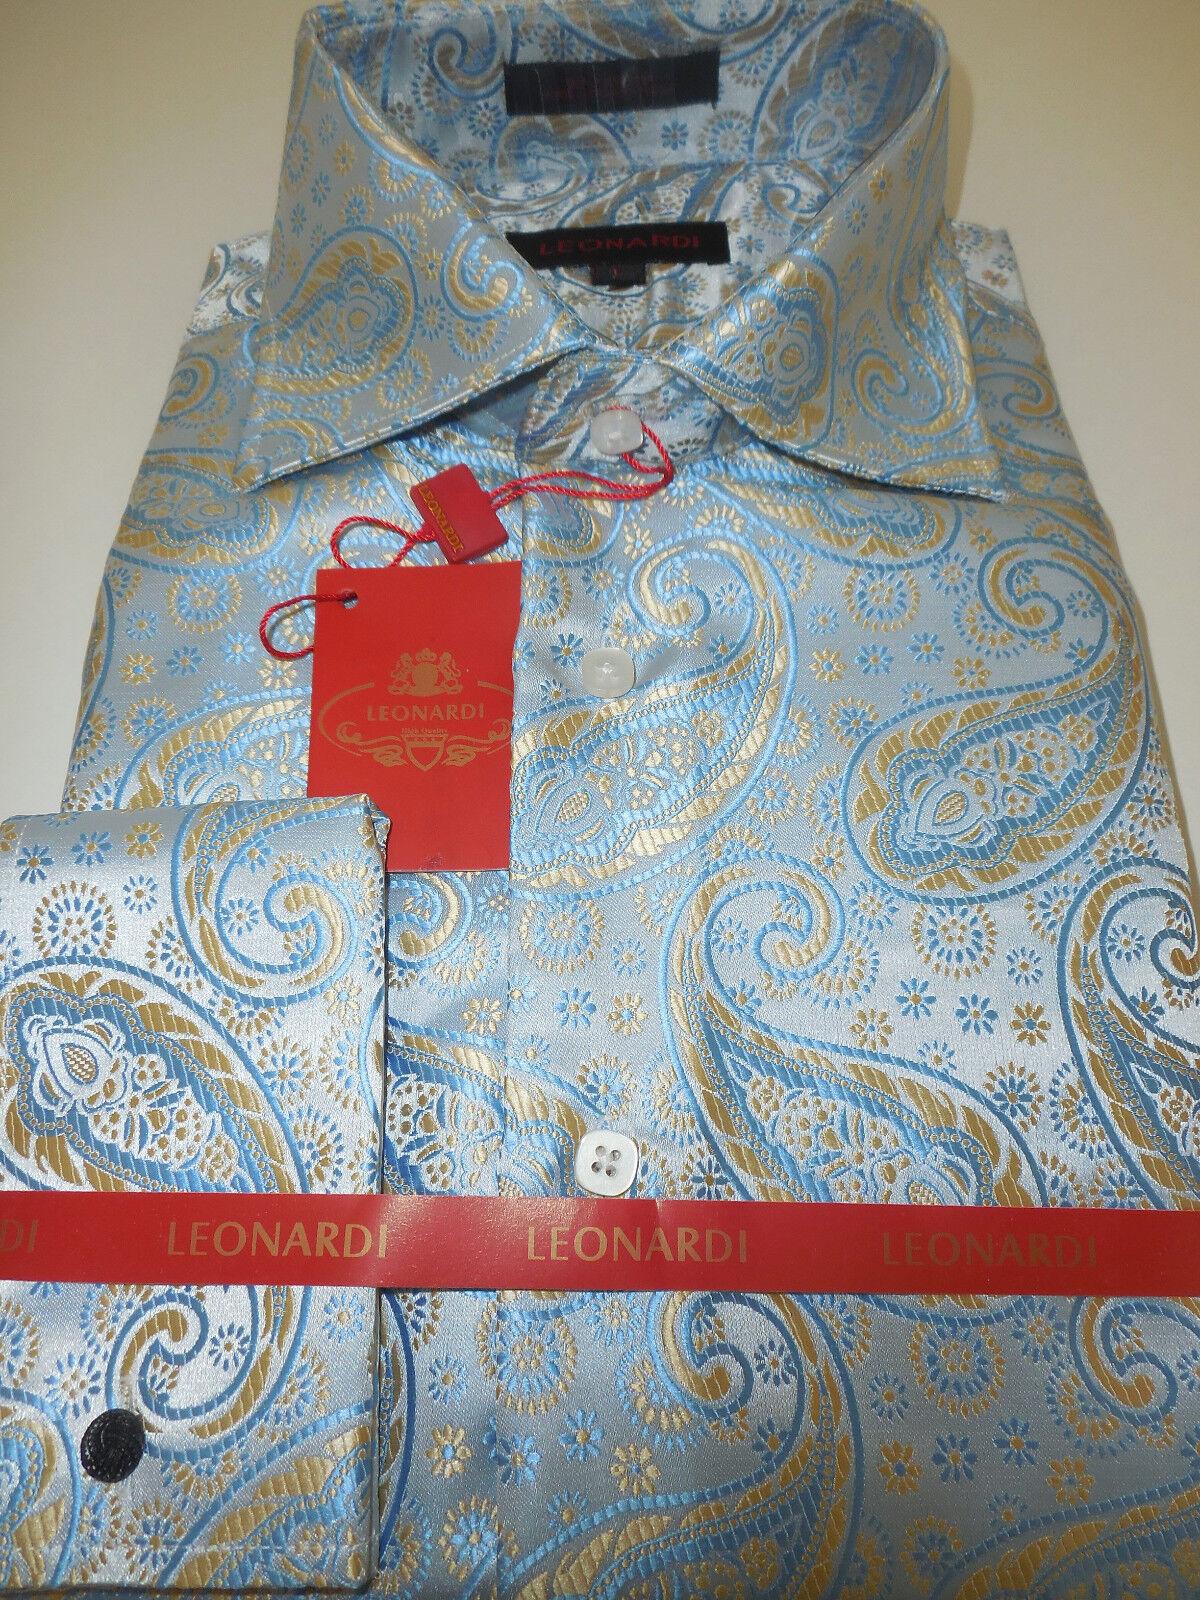 herren Leonardi 397 Light Blau Paisley High halsband Cuffed hemd Größe  L XL